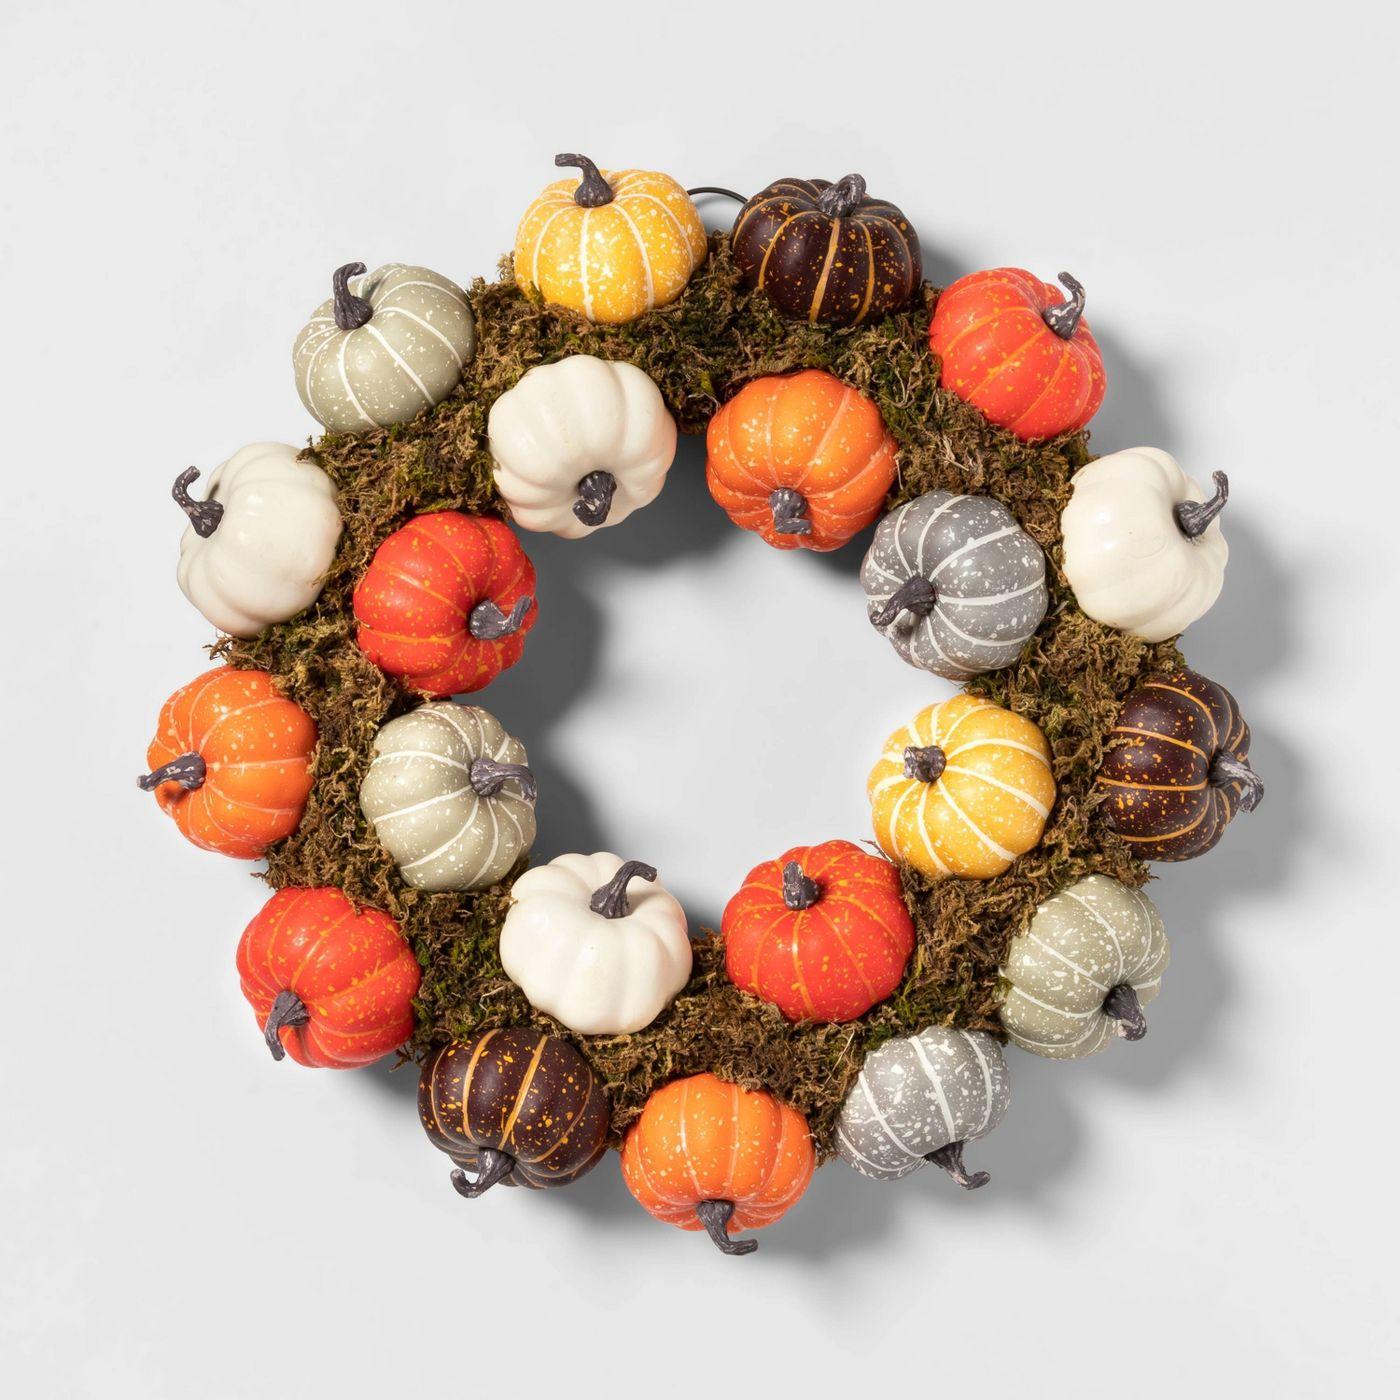 Harvest Pumpkin Decorative Wreath - Spritz™ - image 1 of 1